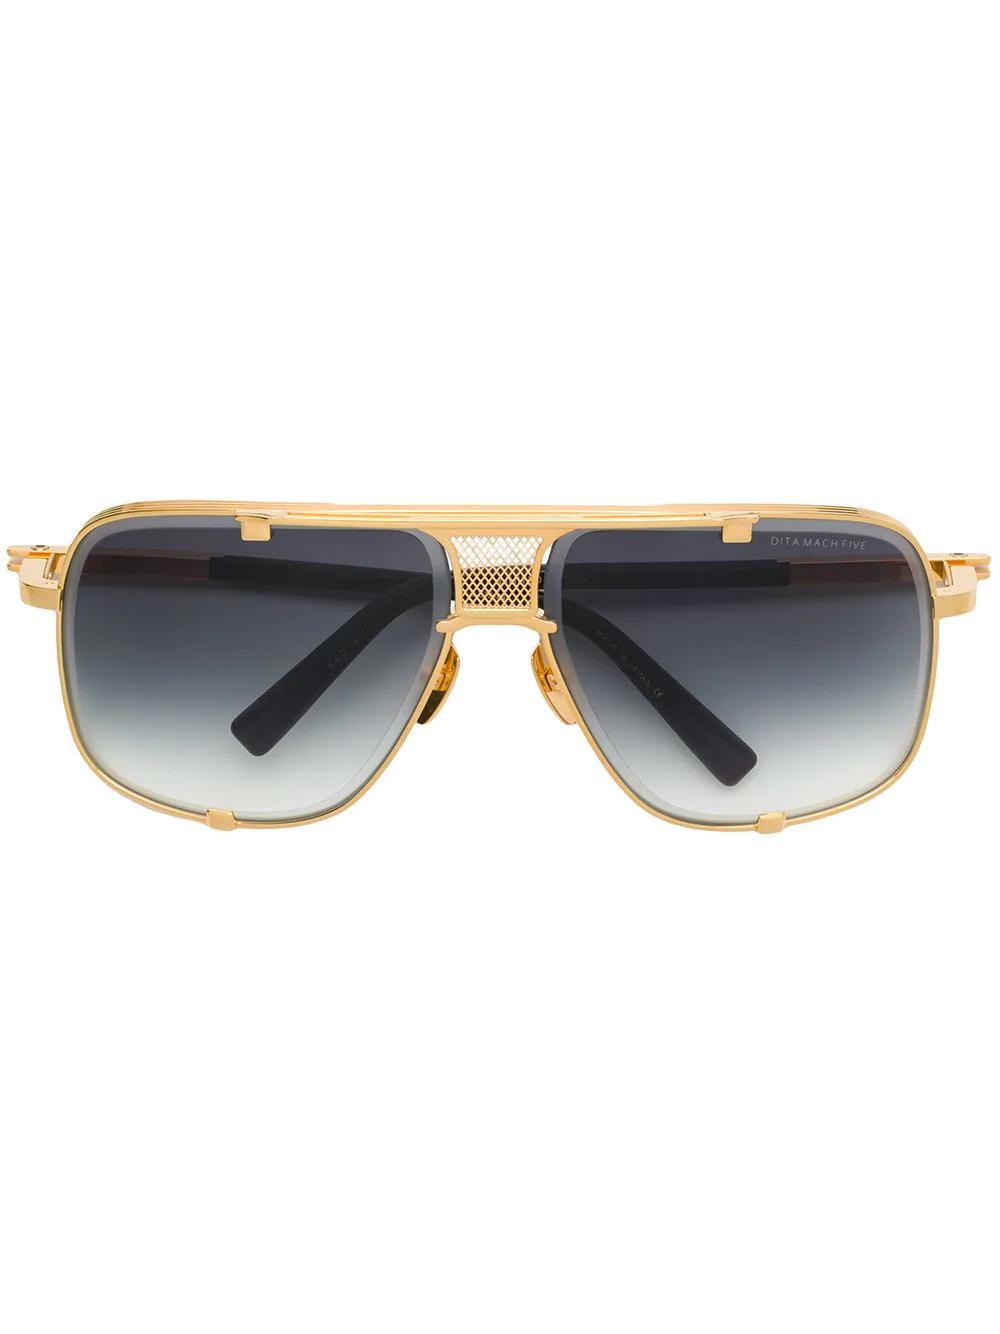 6f6bd10b121 Dita Eyewear Mach Five Sunglasses - Gold